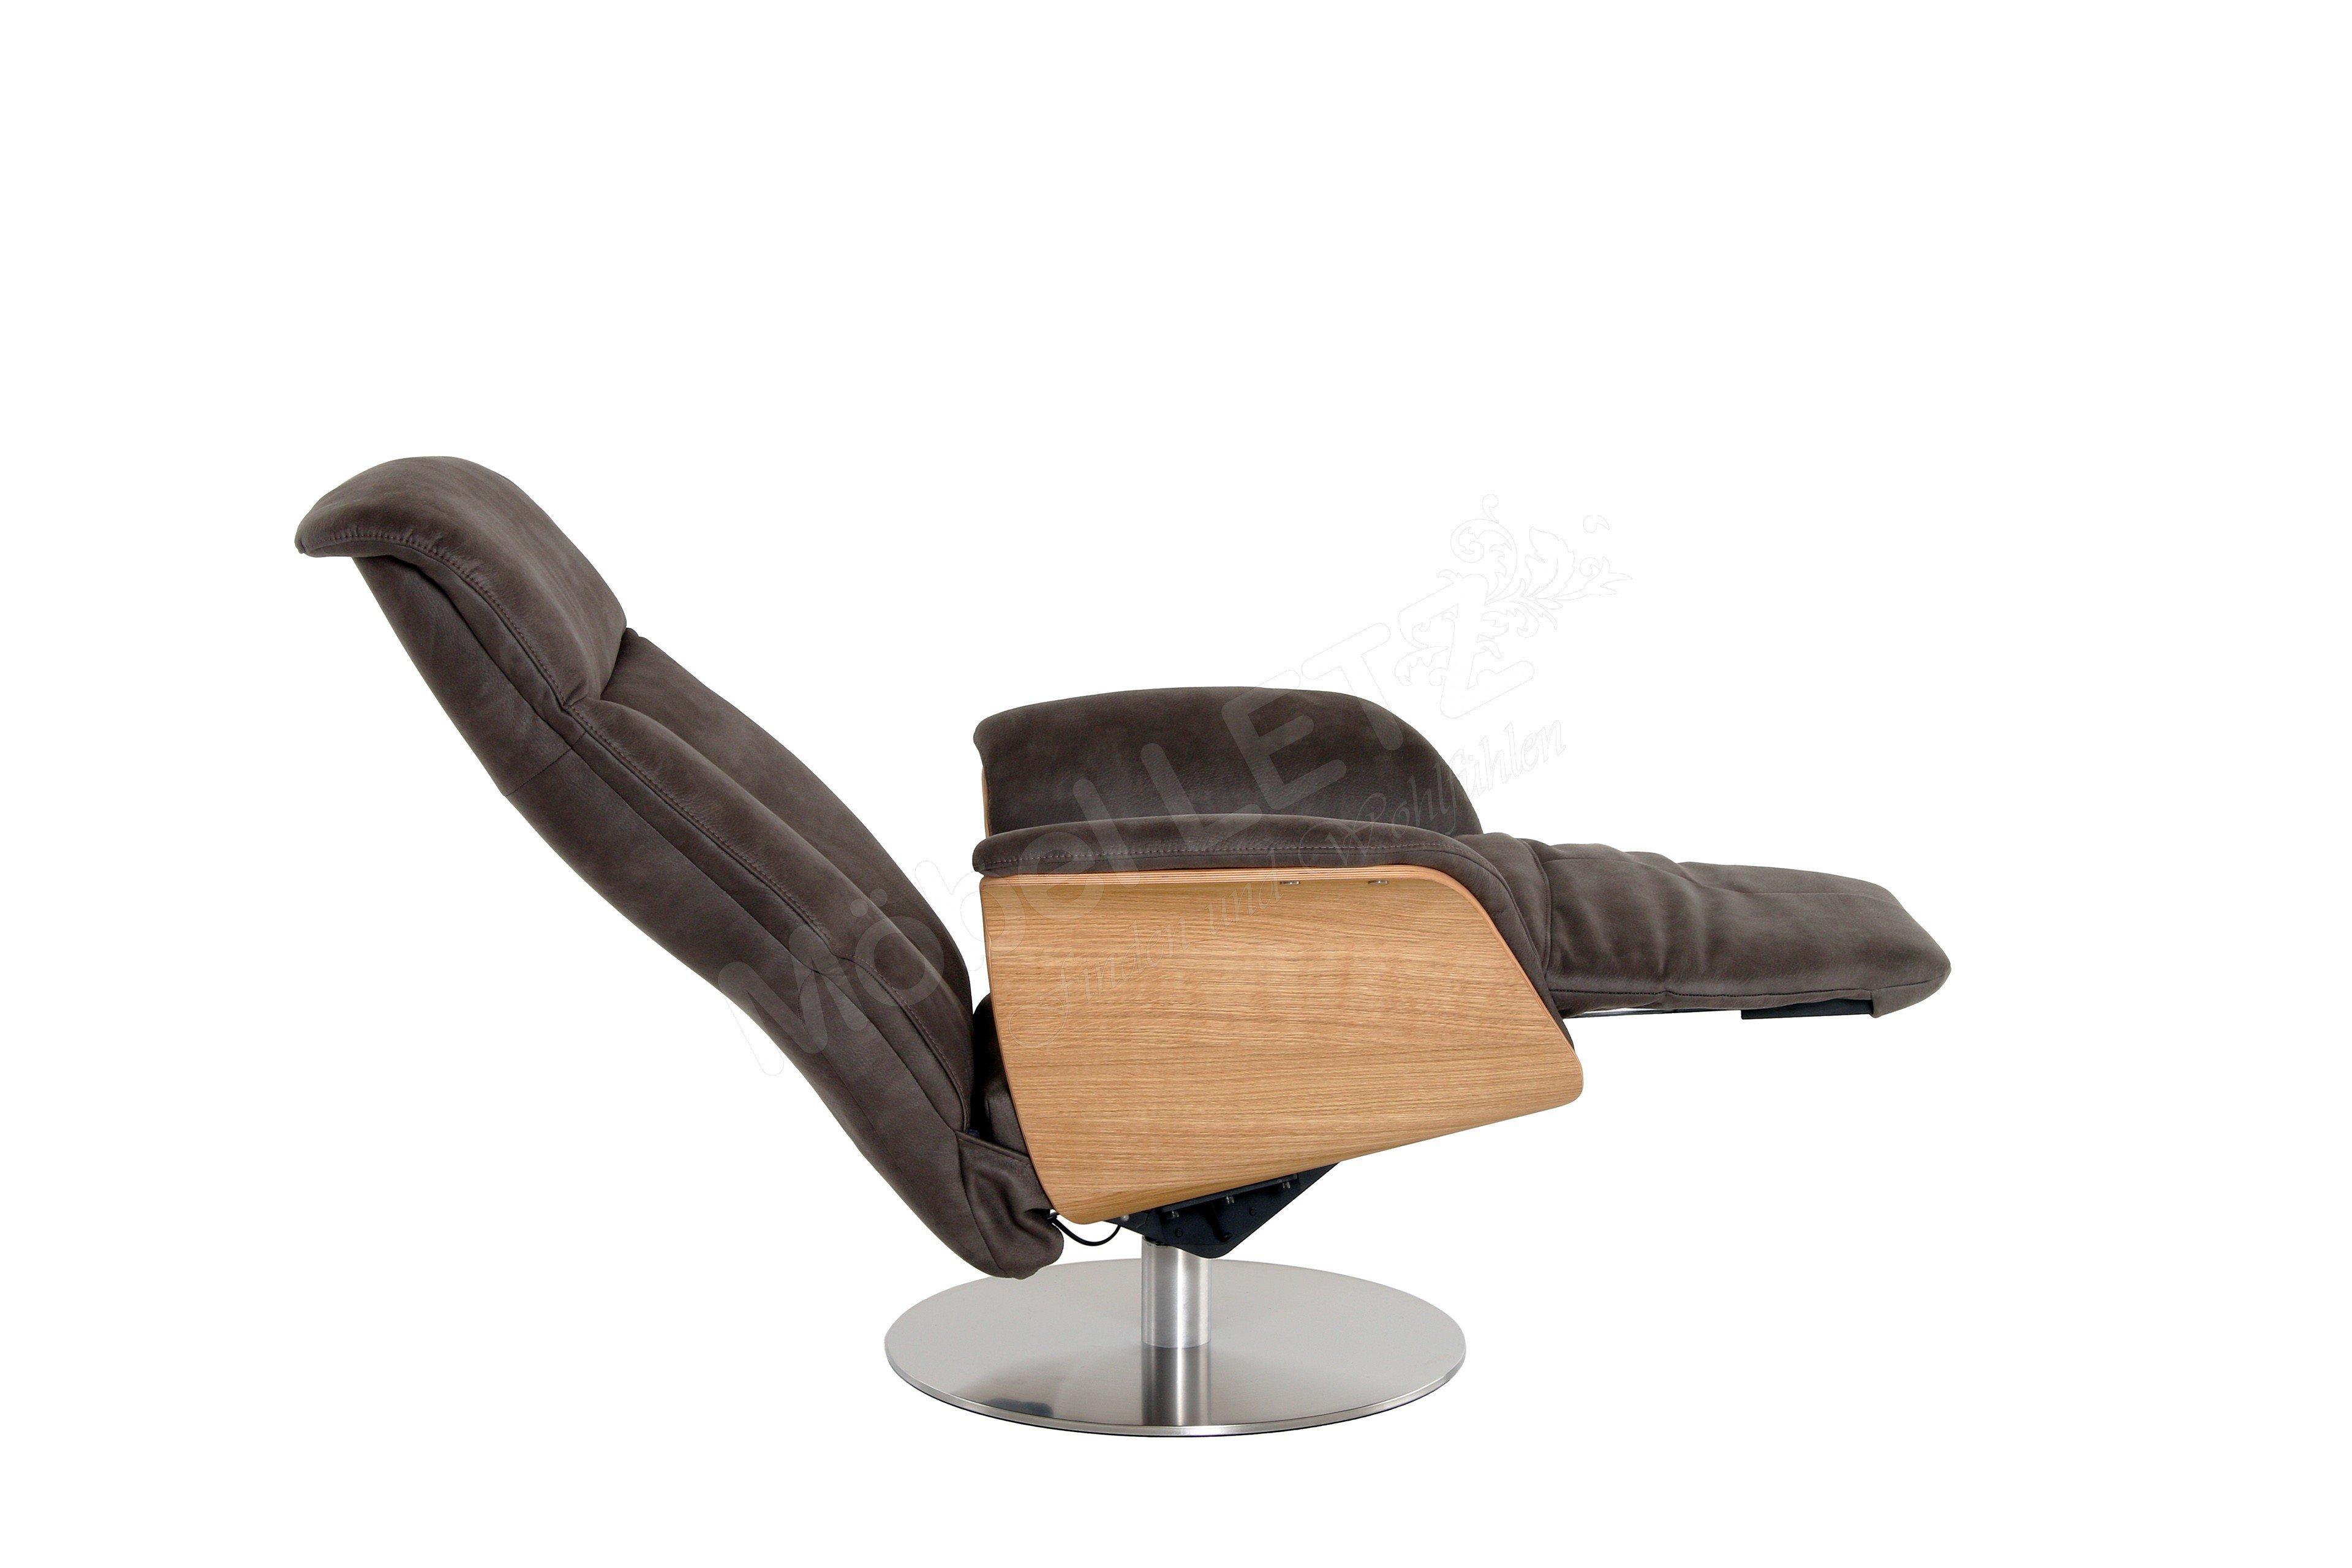 skandinavische m bel jarkko funktionssessel in dunkelbraun m bel letz ihr online shop. Black Bedroom Furniture Sets. Home Design Ideas